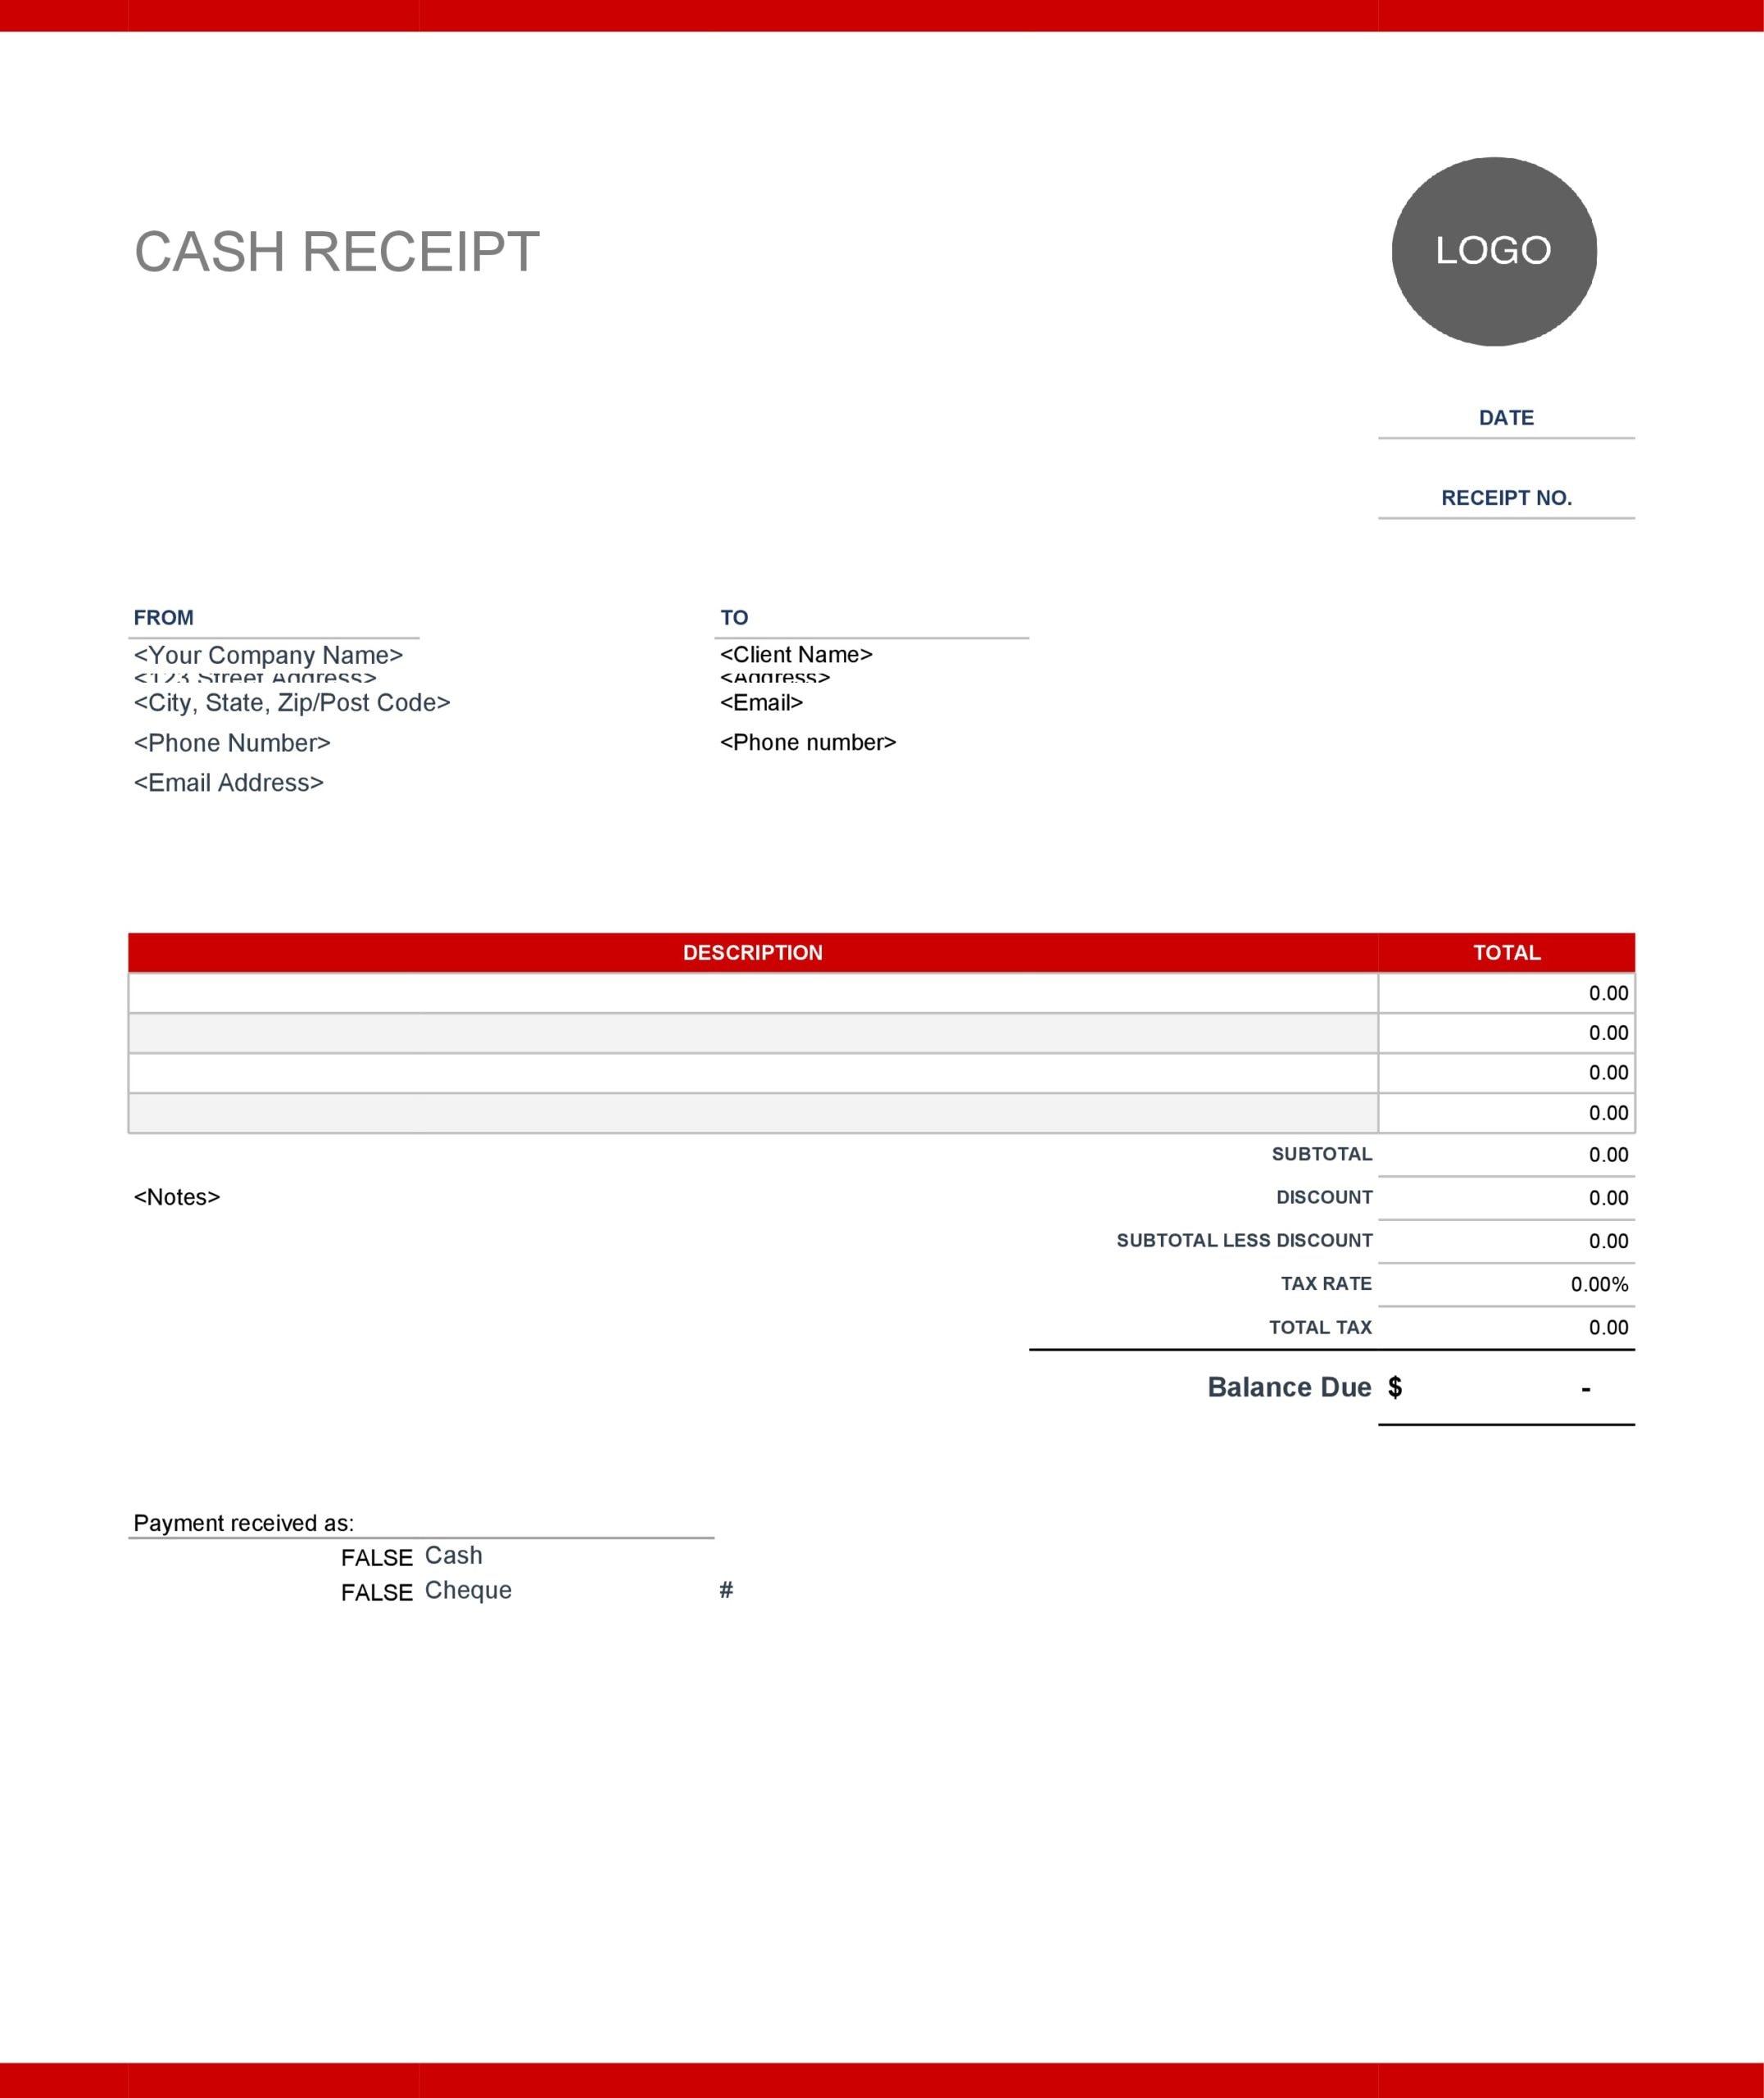 cash receipt 04